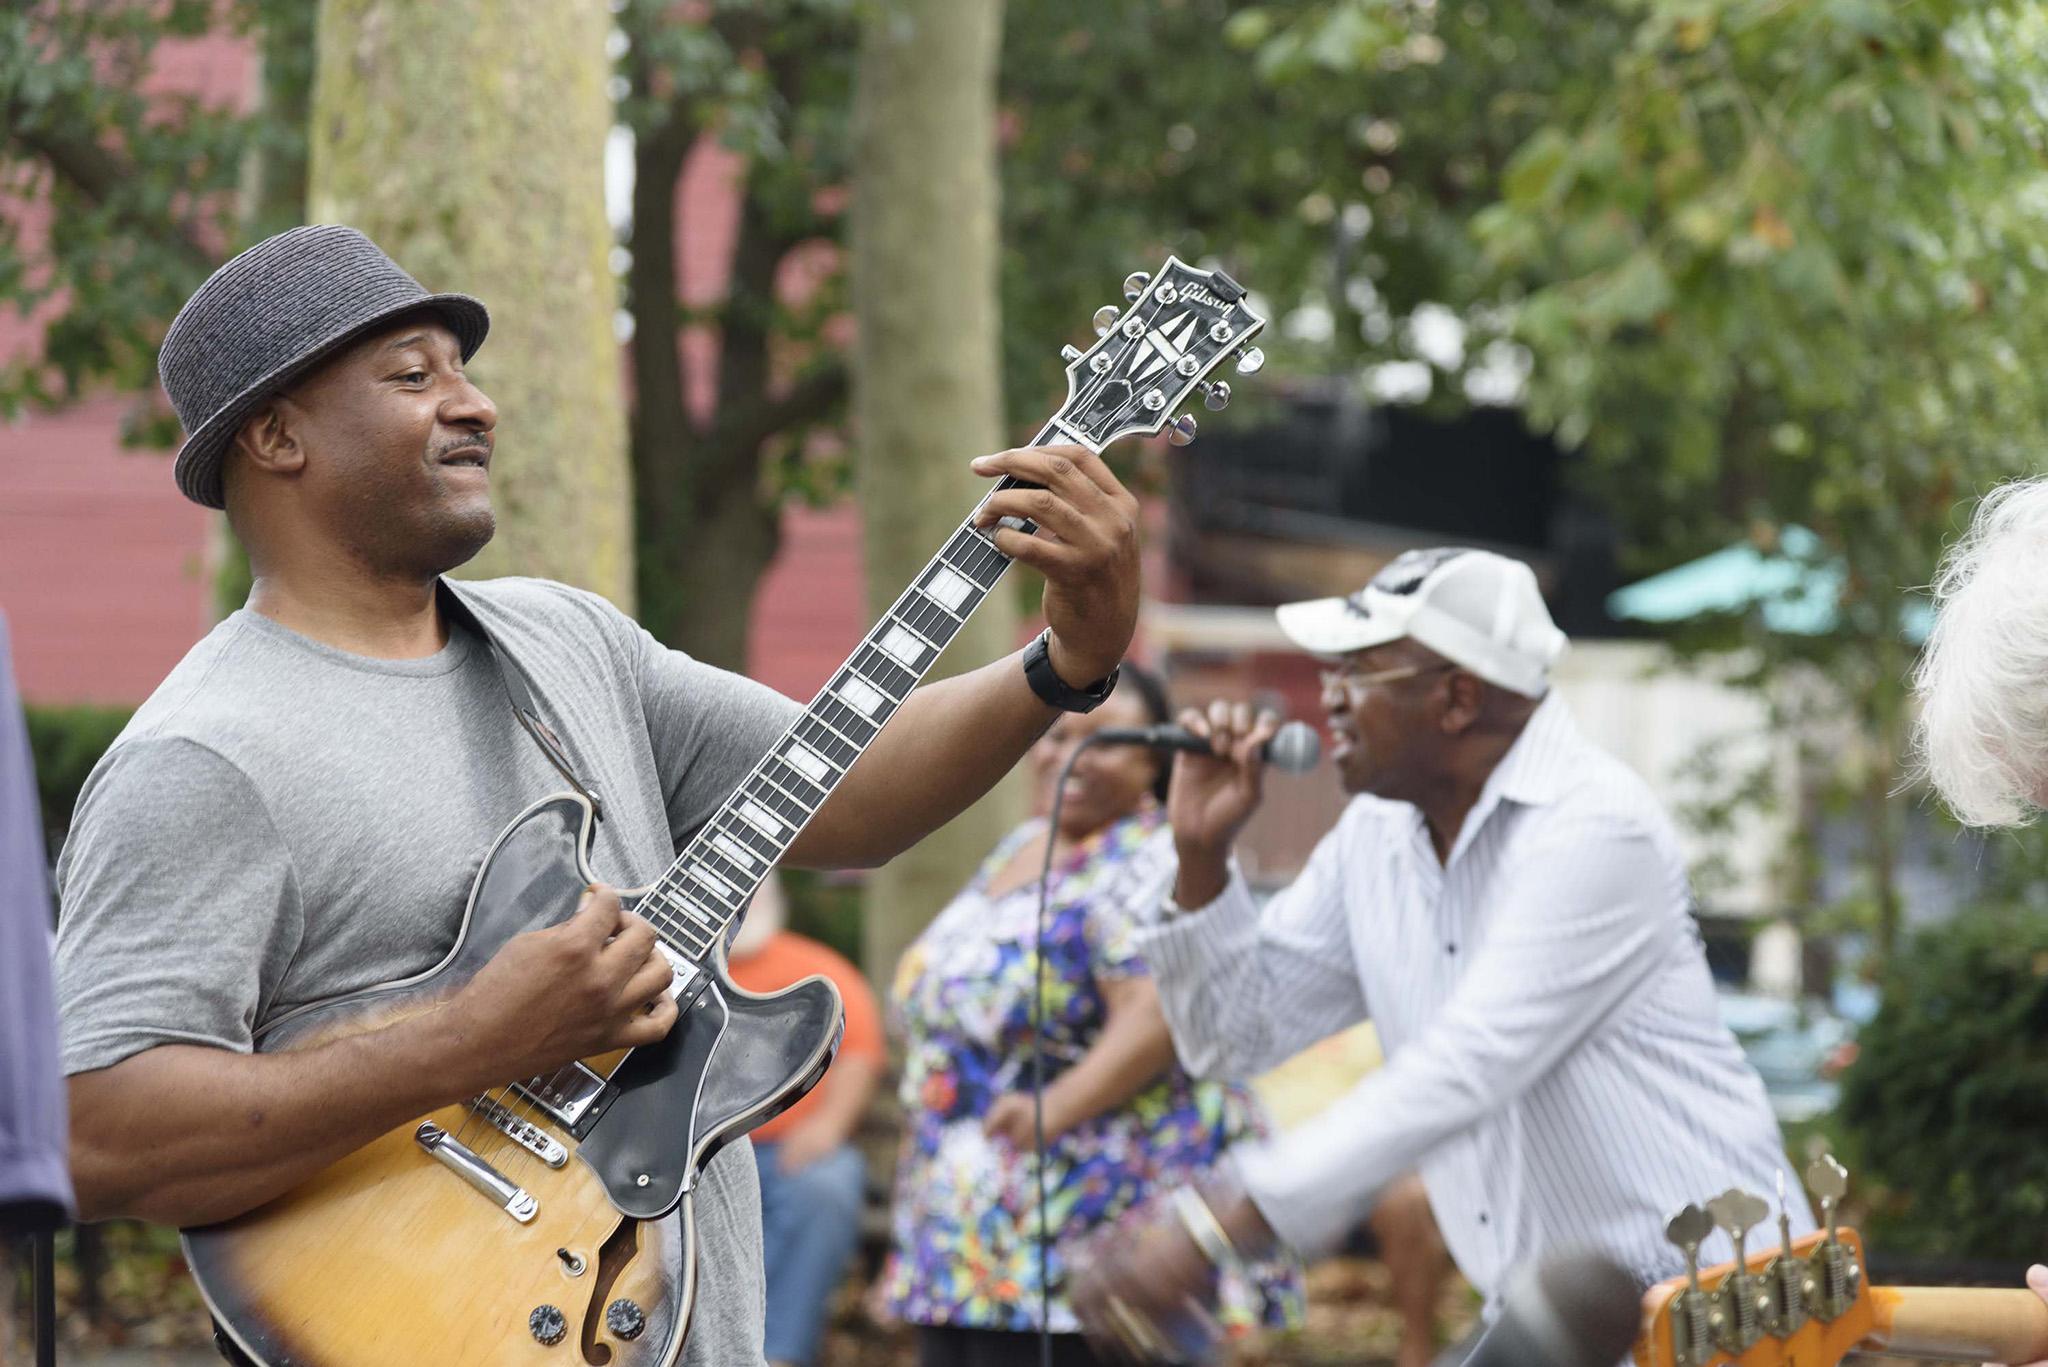 Live music at the arts and crafts fair | Photo: Rick DeWitt